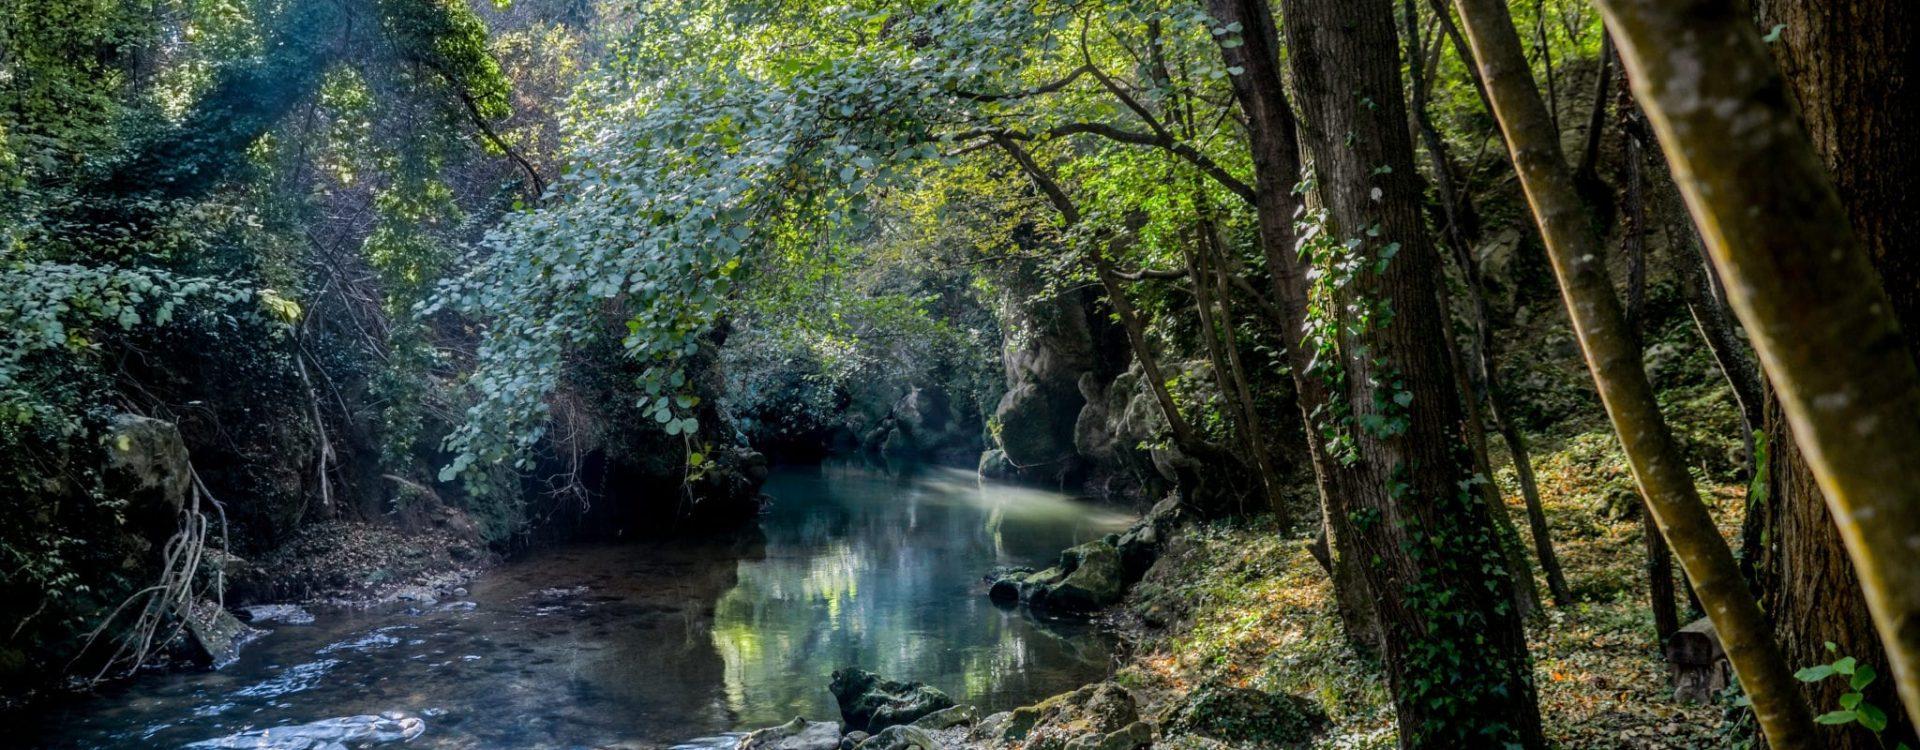 _fiume 3